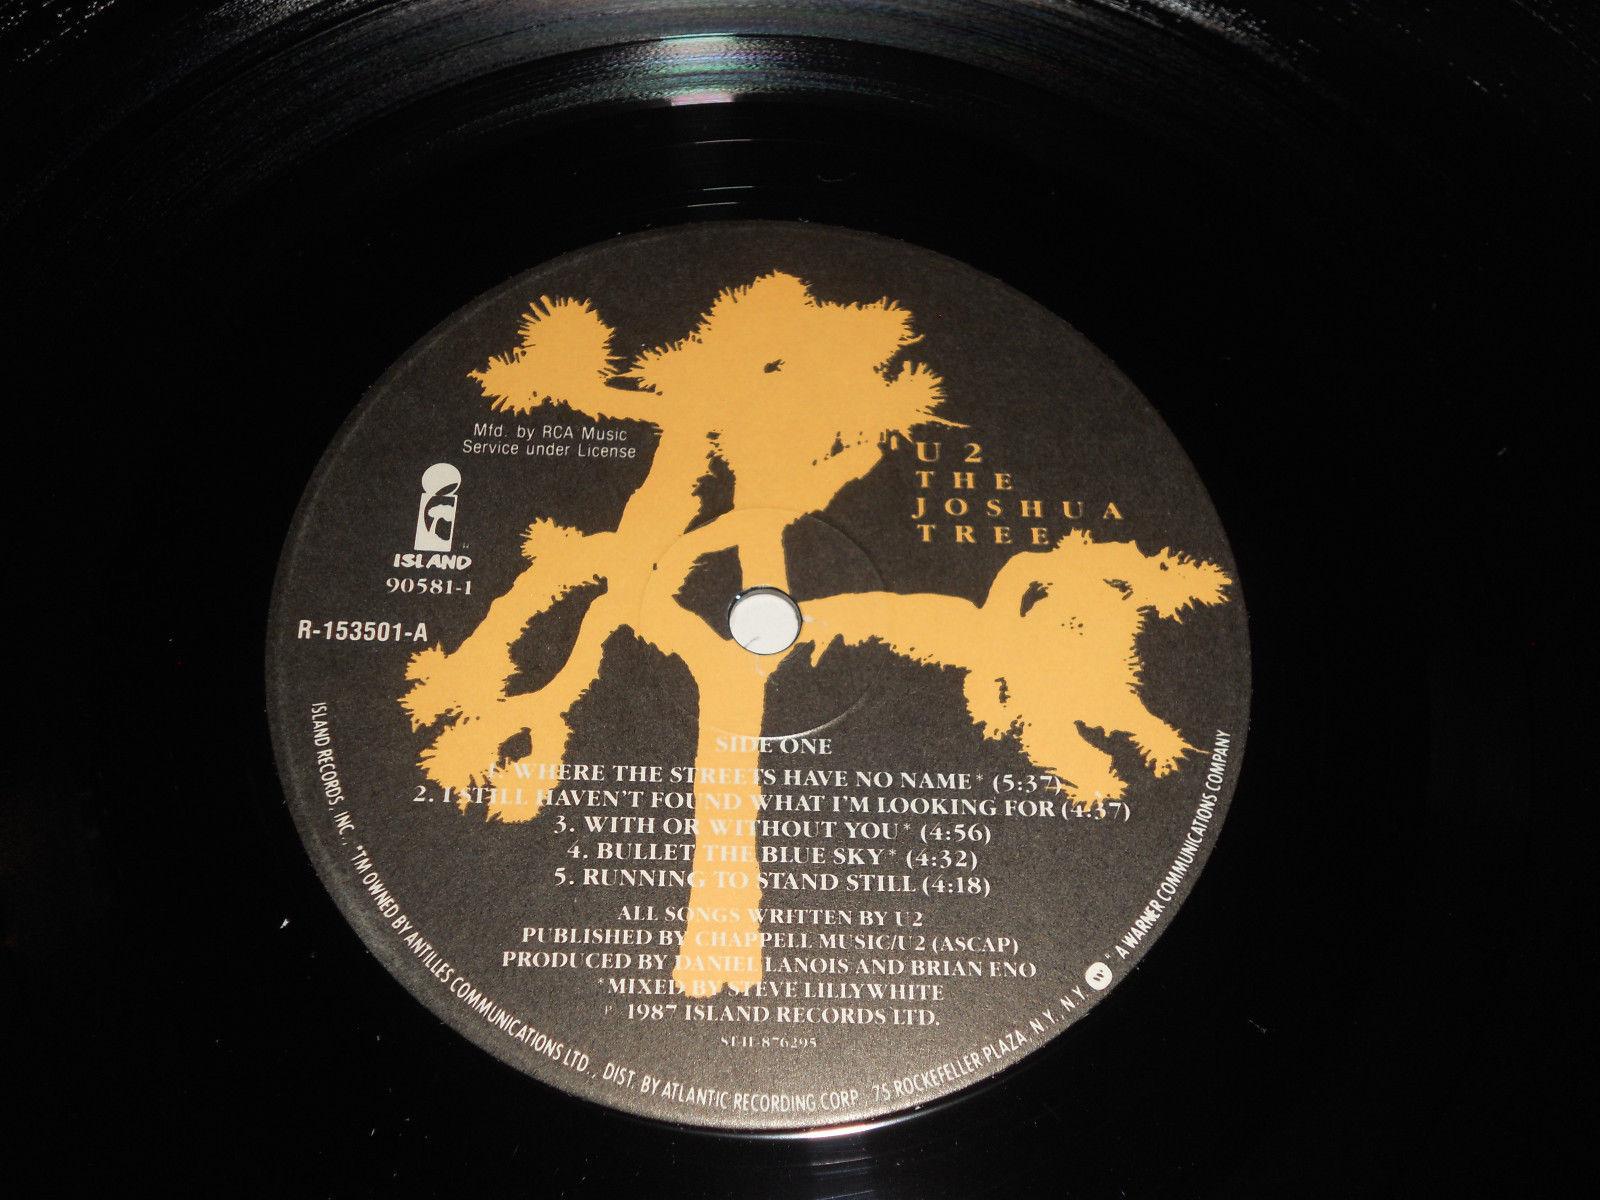 U2 NM The Joshua Tree R-153501 Island Near Mint U2 bono The Edge Adam Clayton